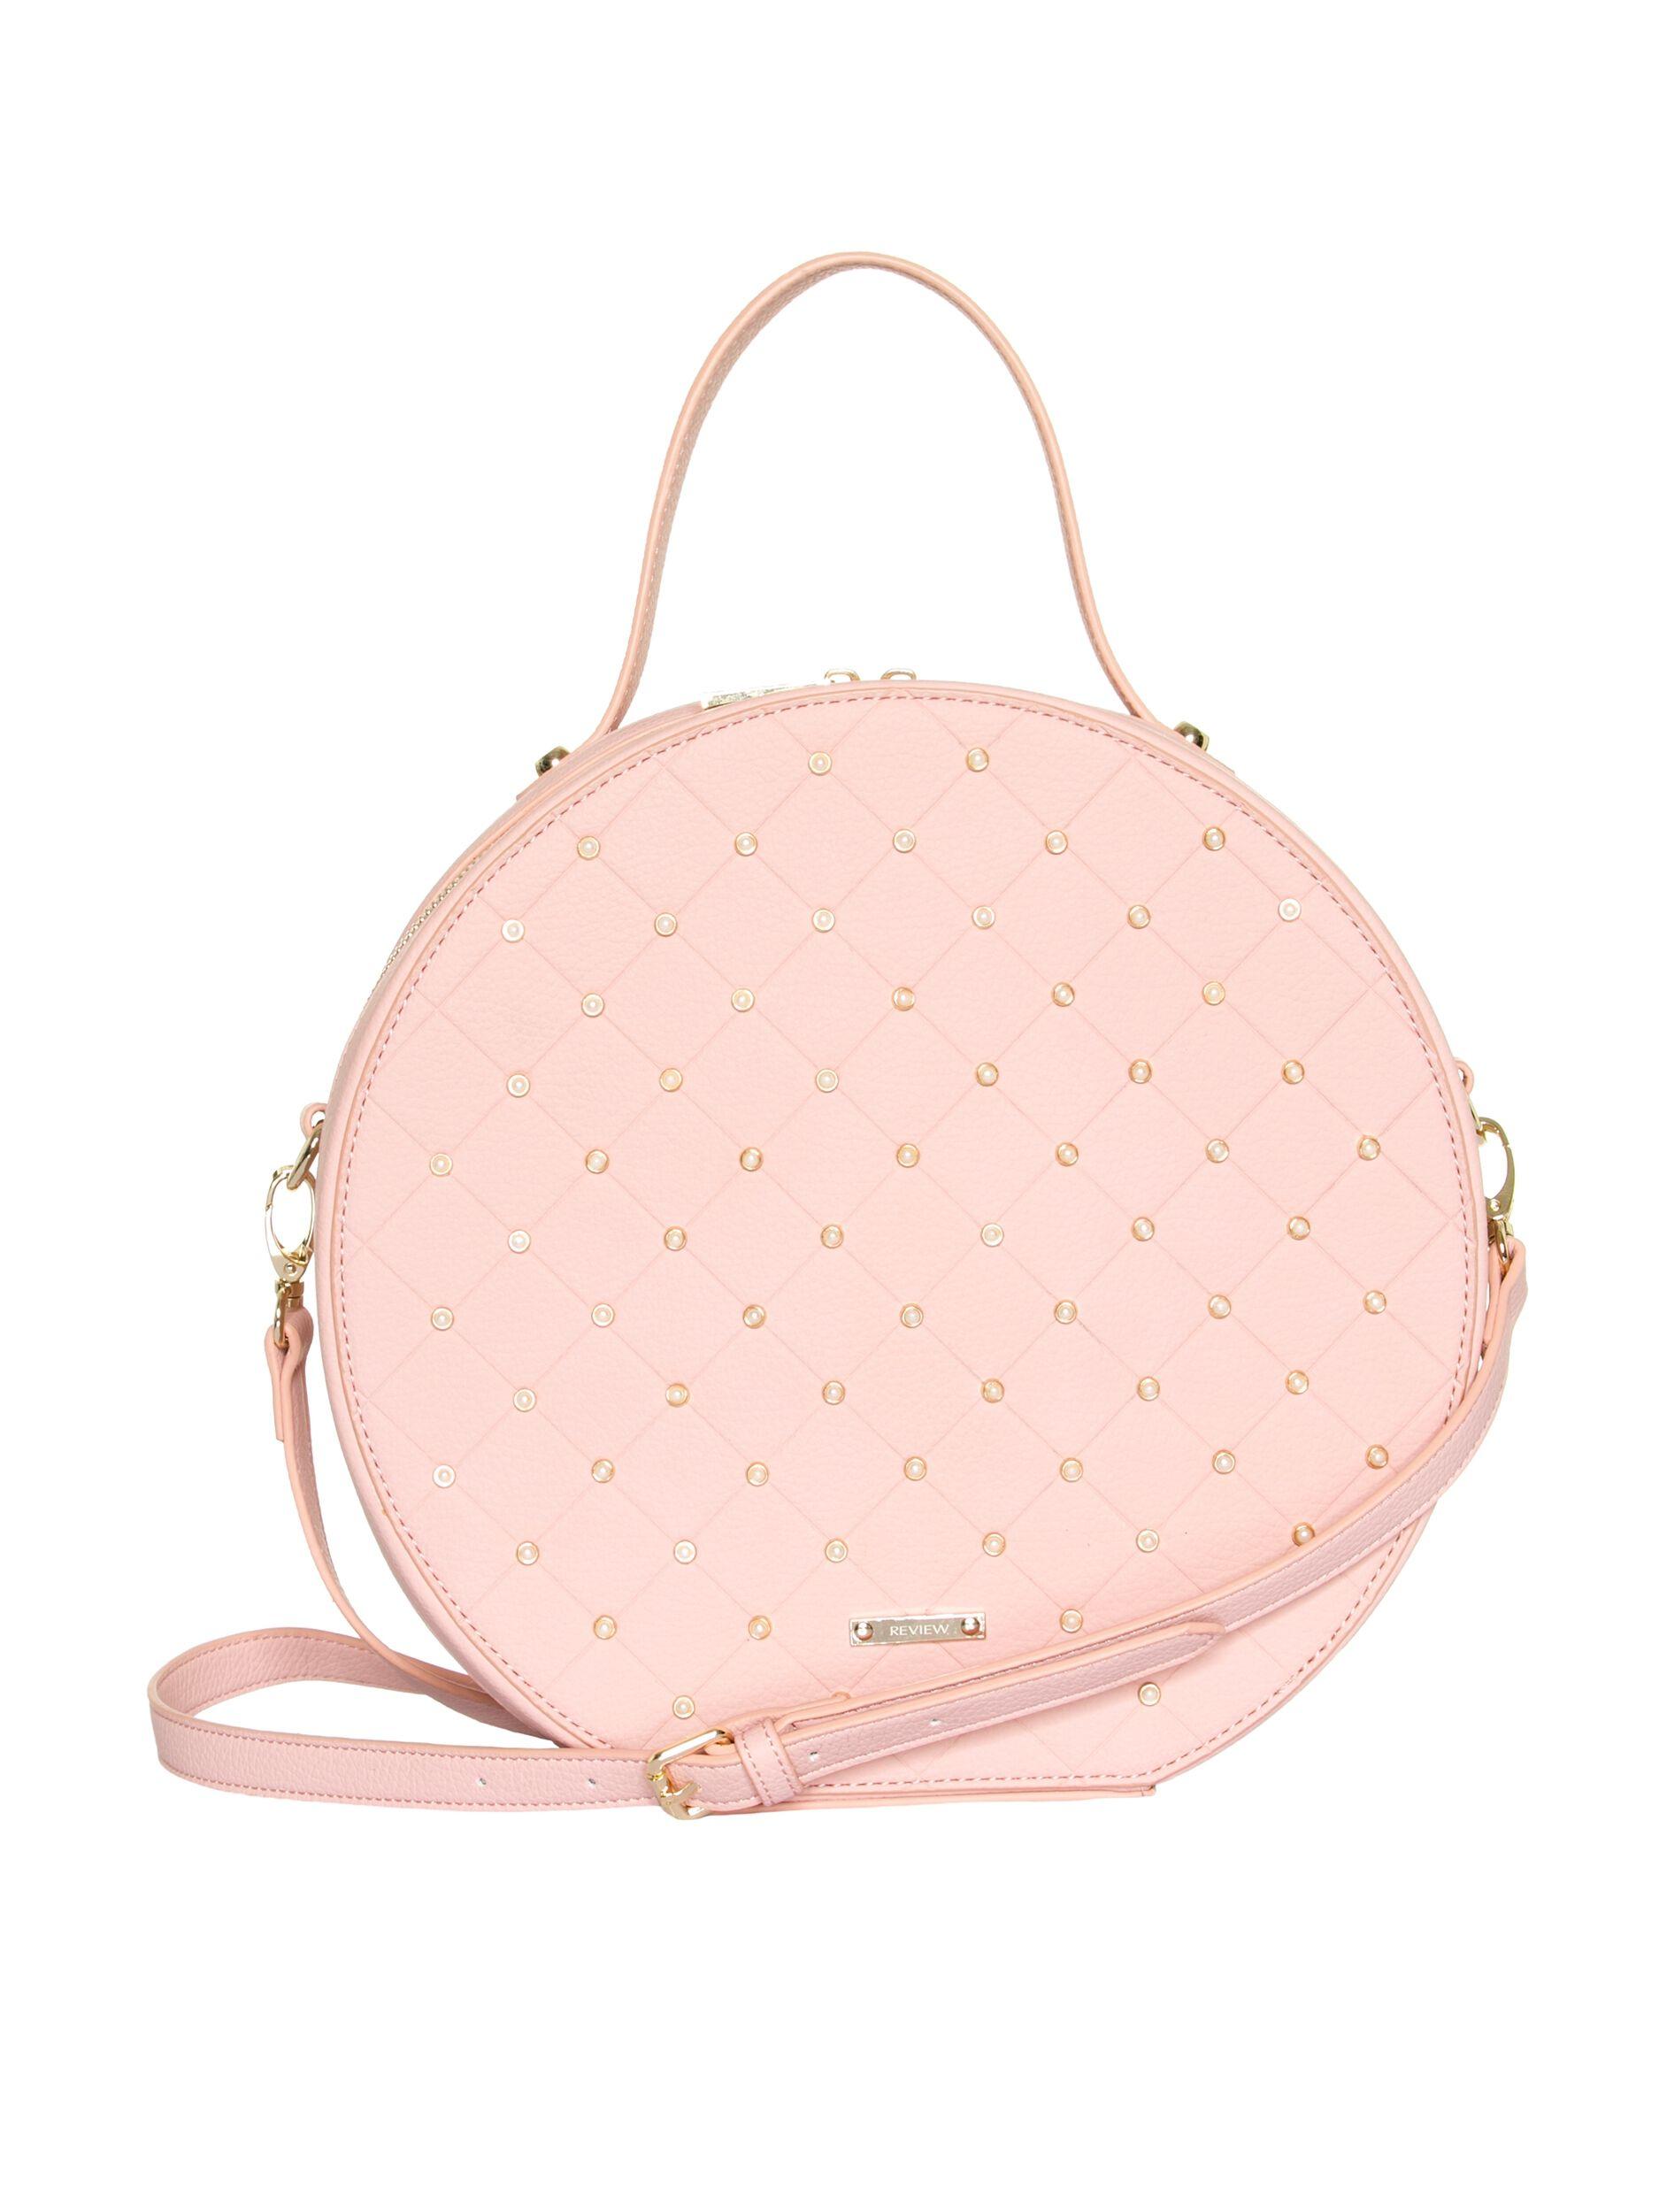 Willow Circle Bag